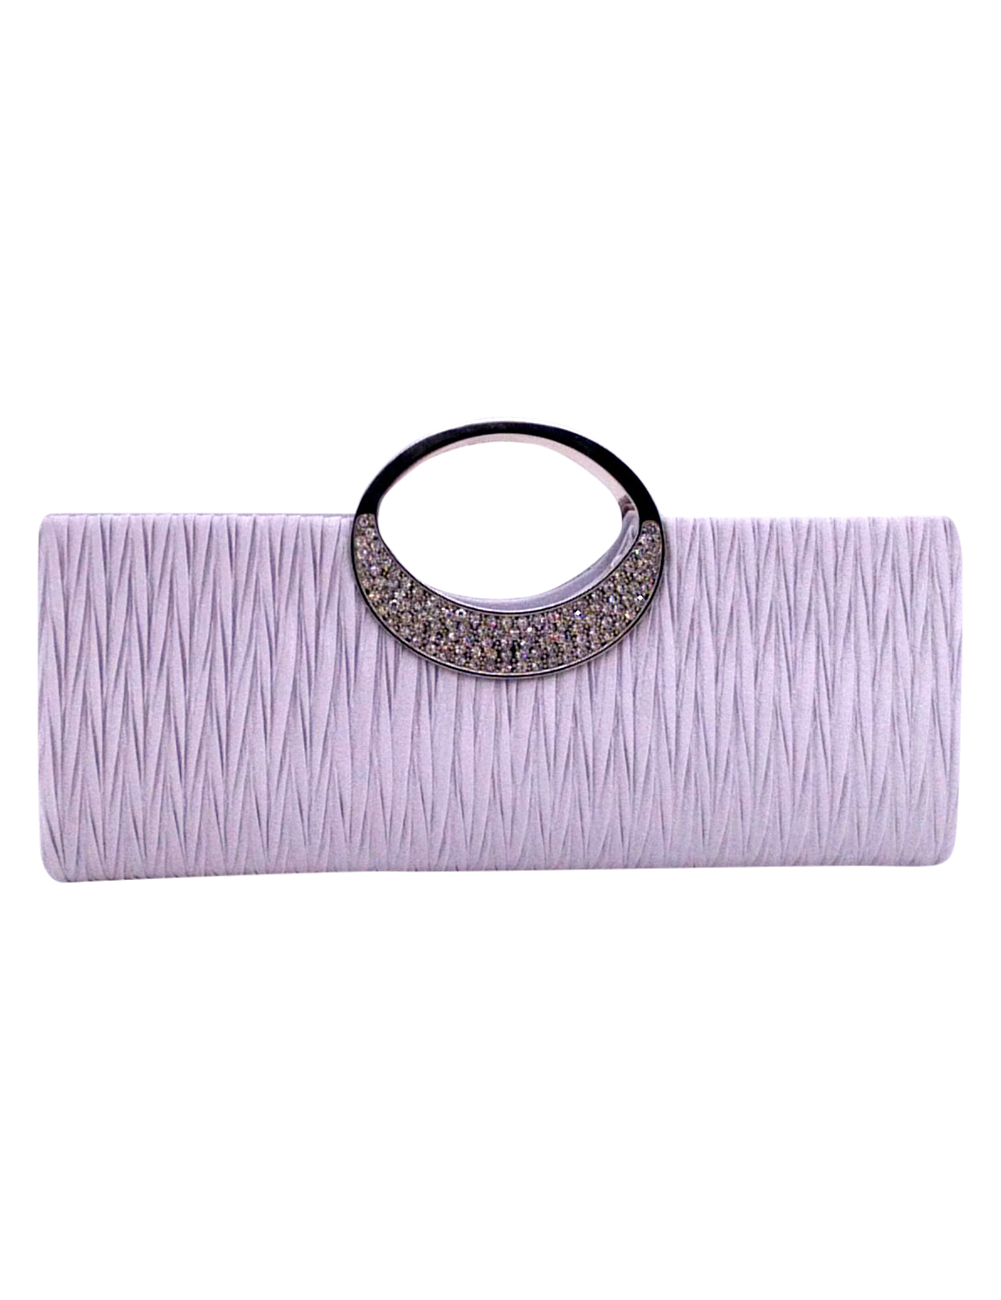 Women's Classic Rhinestone Clutch Dinner Bag Crystal Satin Pleated Handbag Evening Bag with Chain